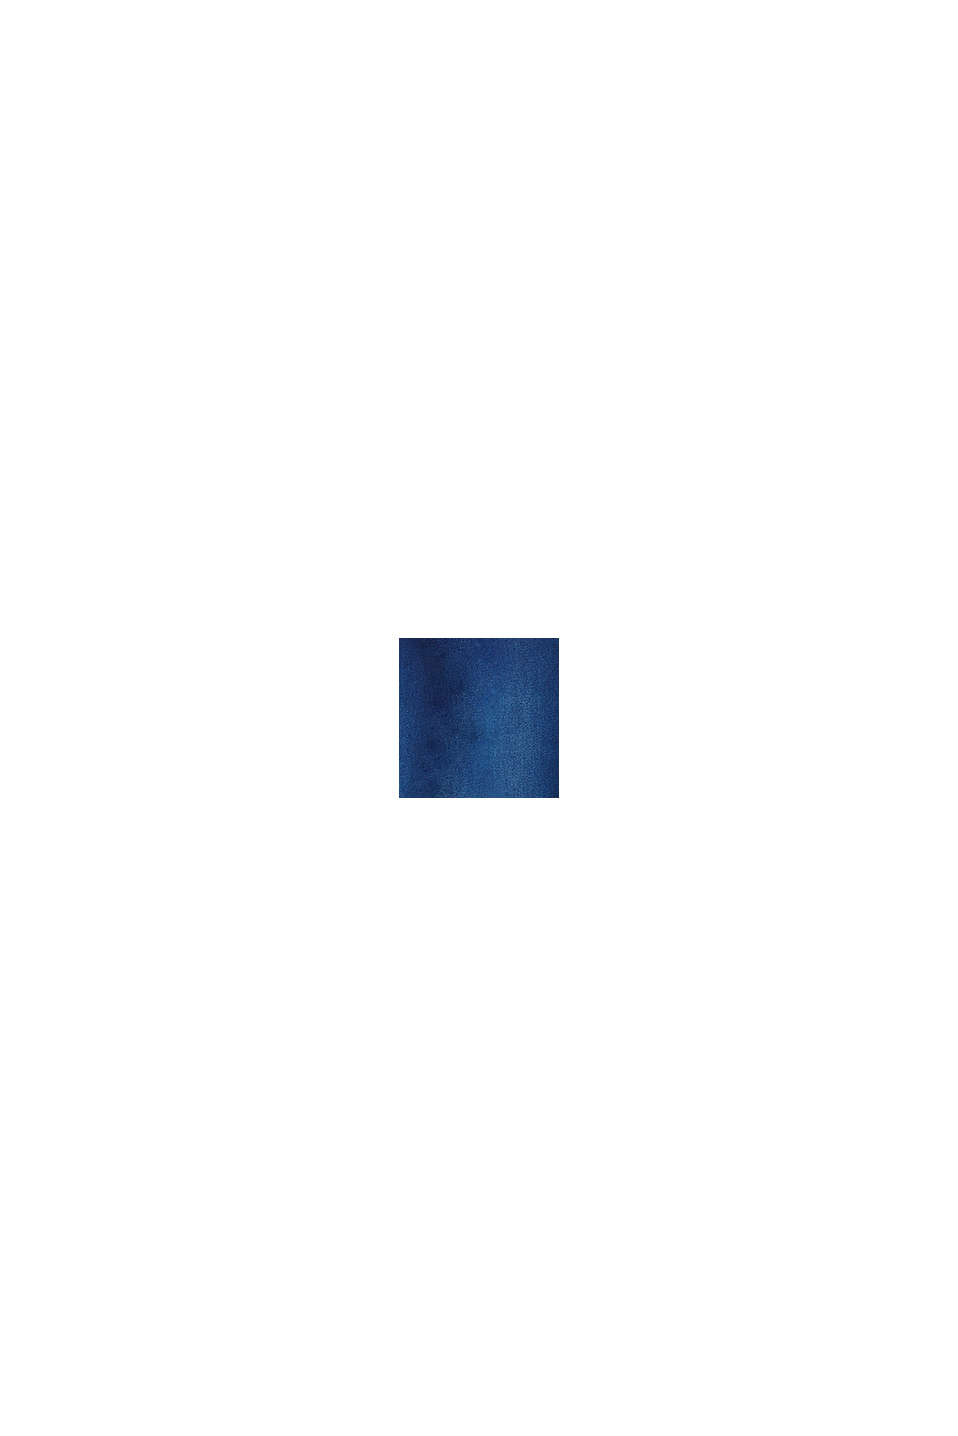 Stretchjeans met band over de buik, DARK WASHED BLUE, swatch